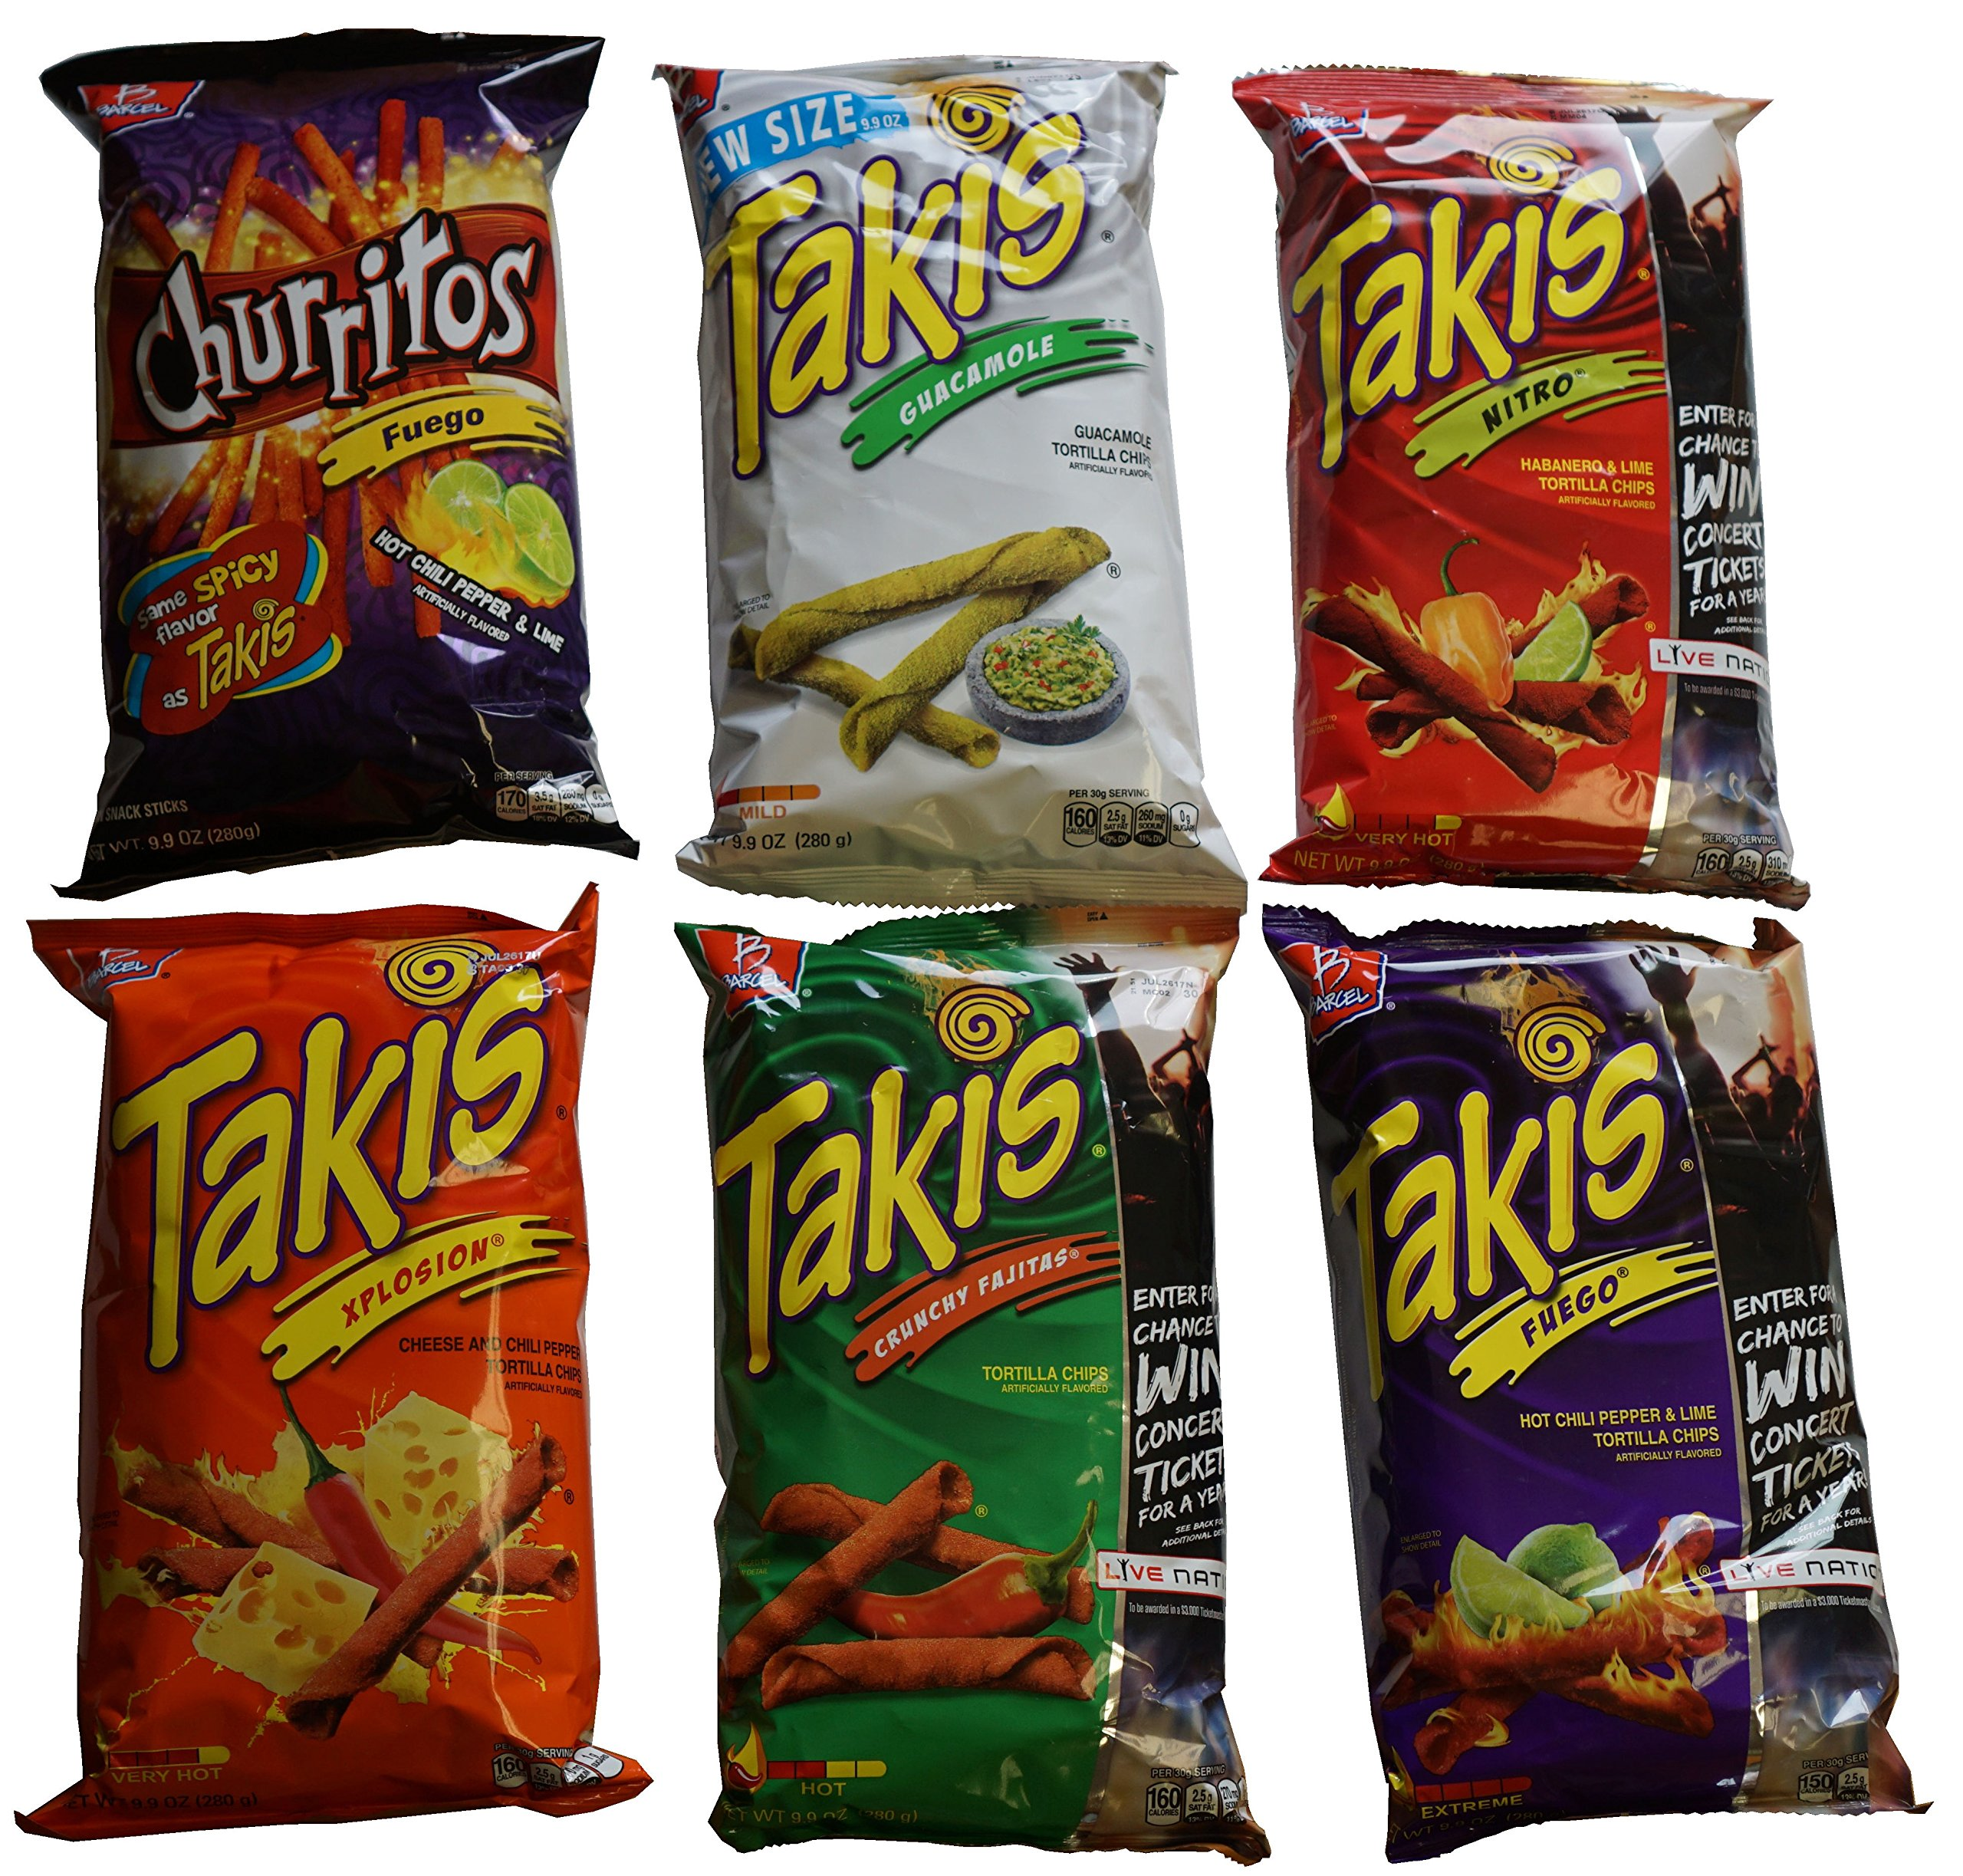 Barcel Takis Tortilla Chips 9.9 oz Sampler (Feugo,Nitro,Churritos,Xplosion,Fajitas,Guacamole) by Barcel